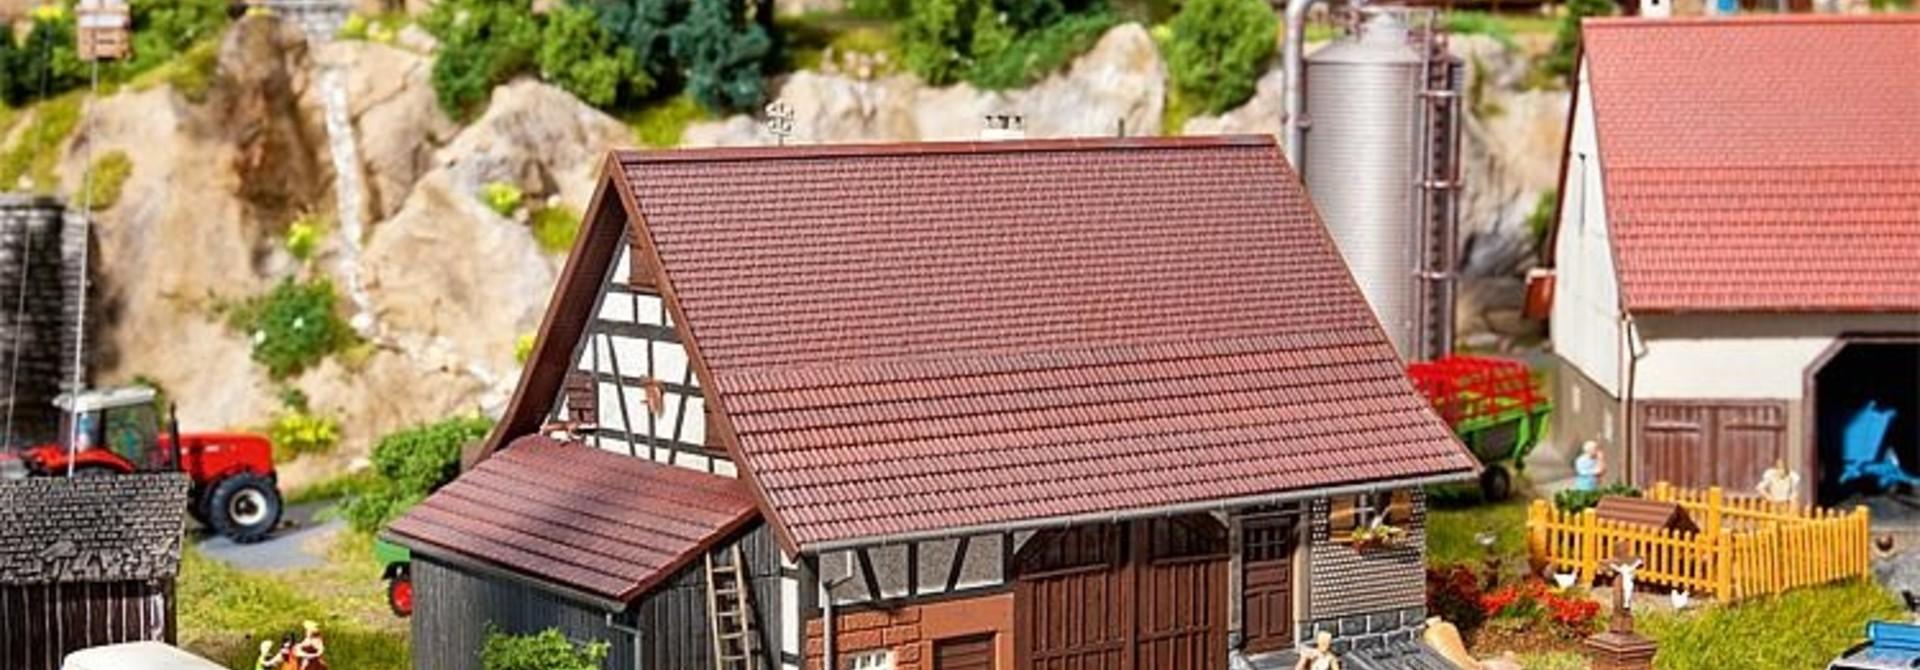 "190160 Aktions-set ""Bauernleben"""